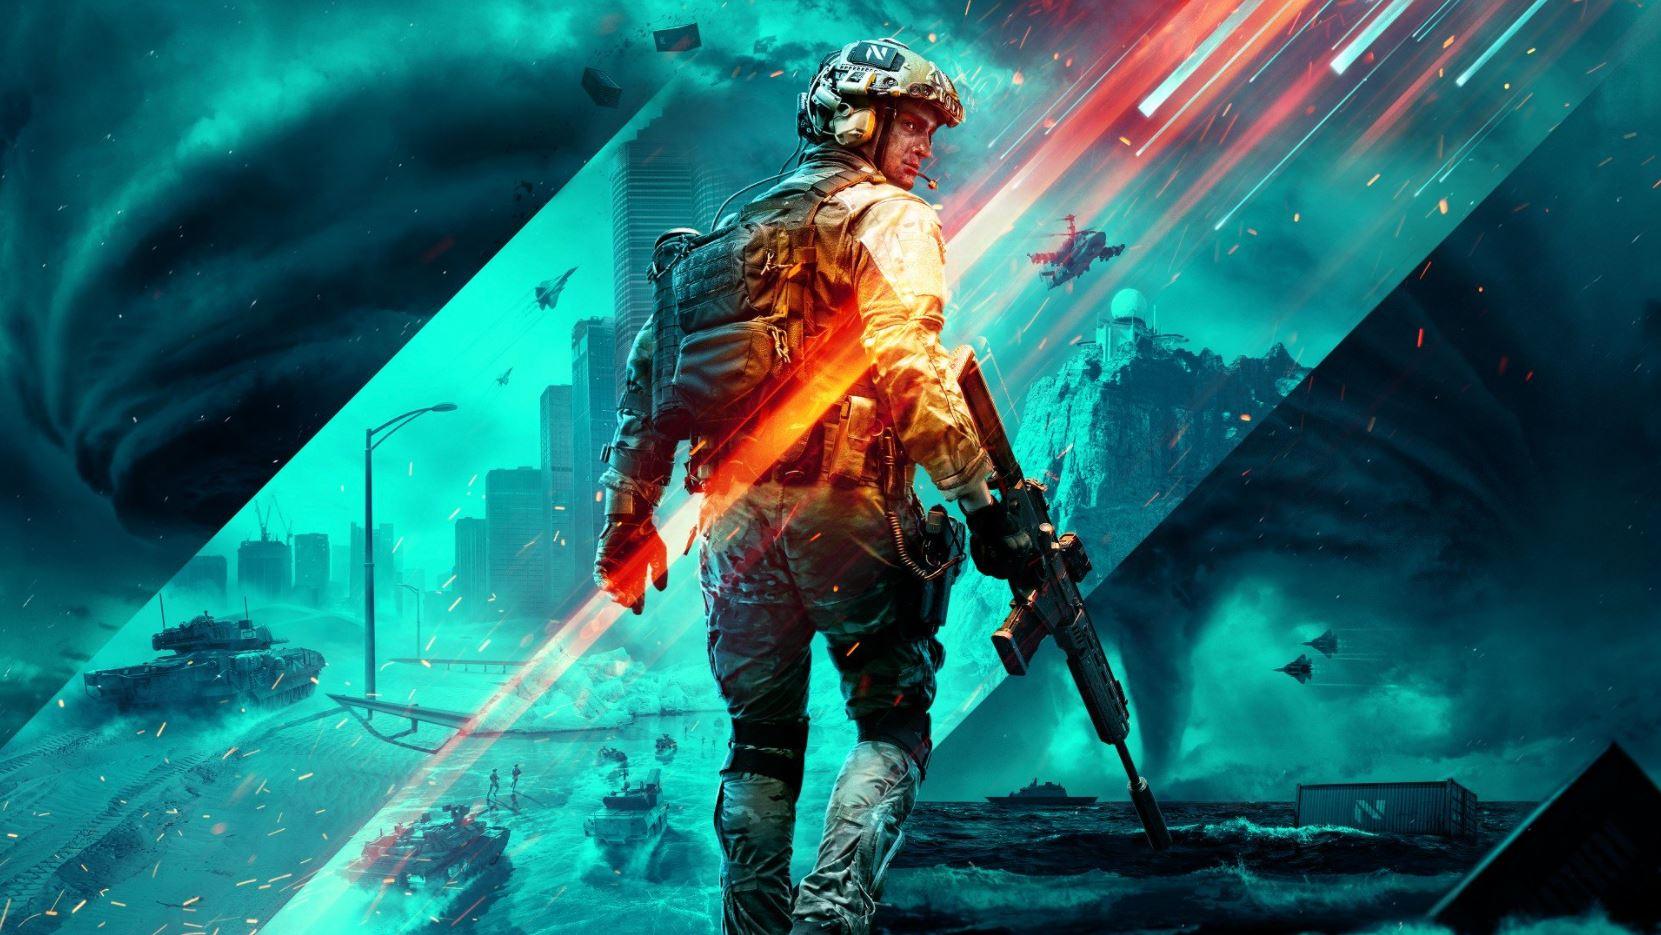 battlefield-2042-cover-art-and-screenshots-leak-on-origin-ahead-of-reveal